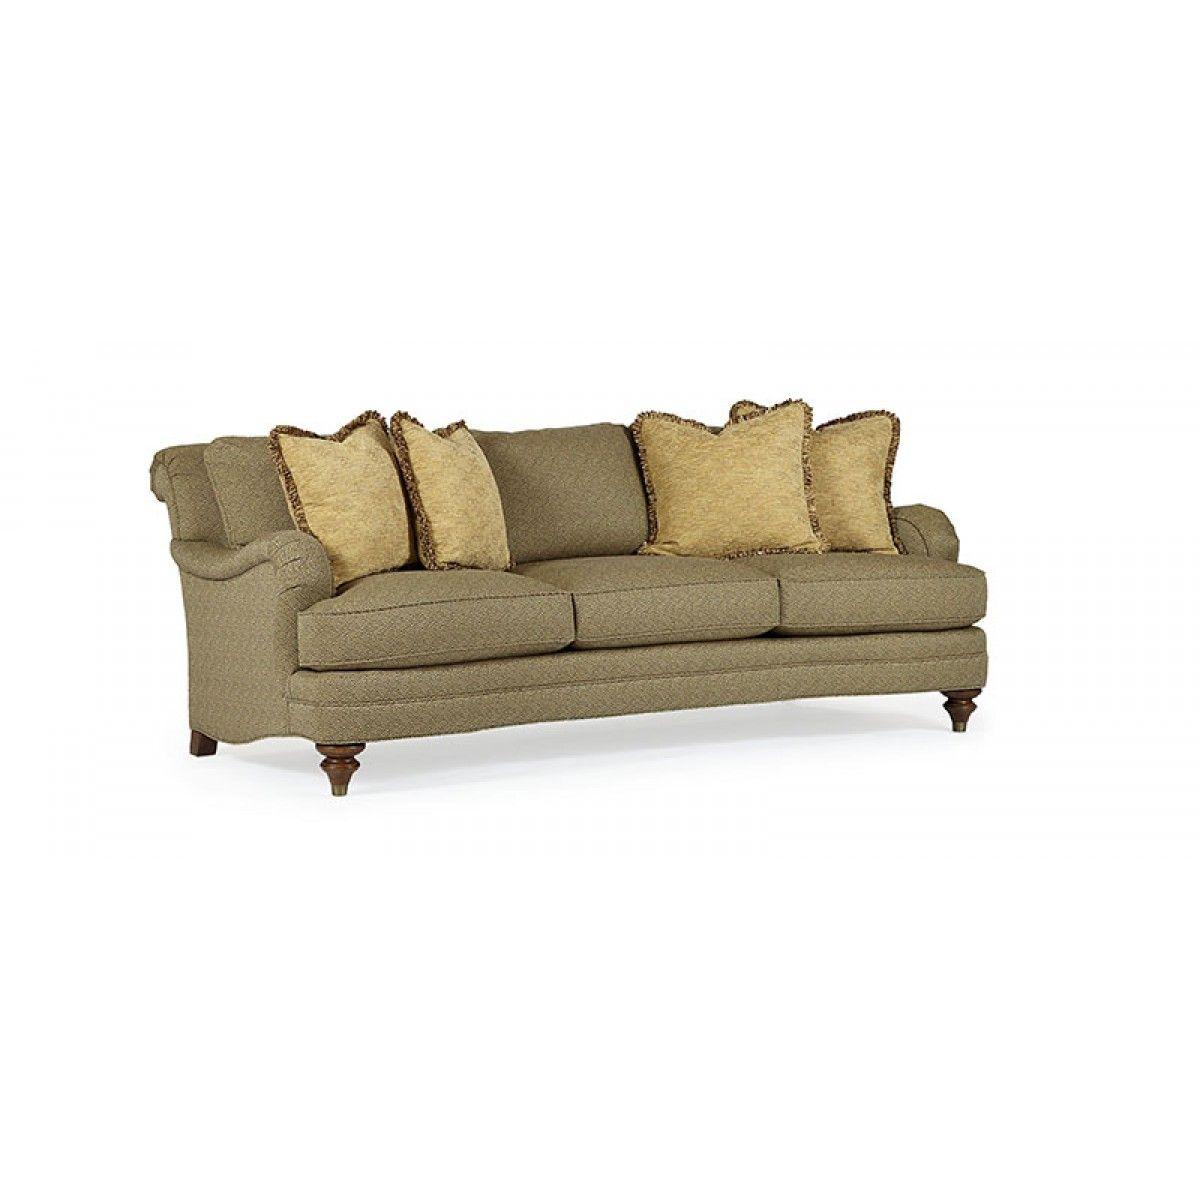 Century Kent Sofa | Century furniture